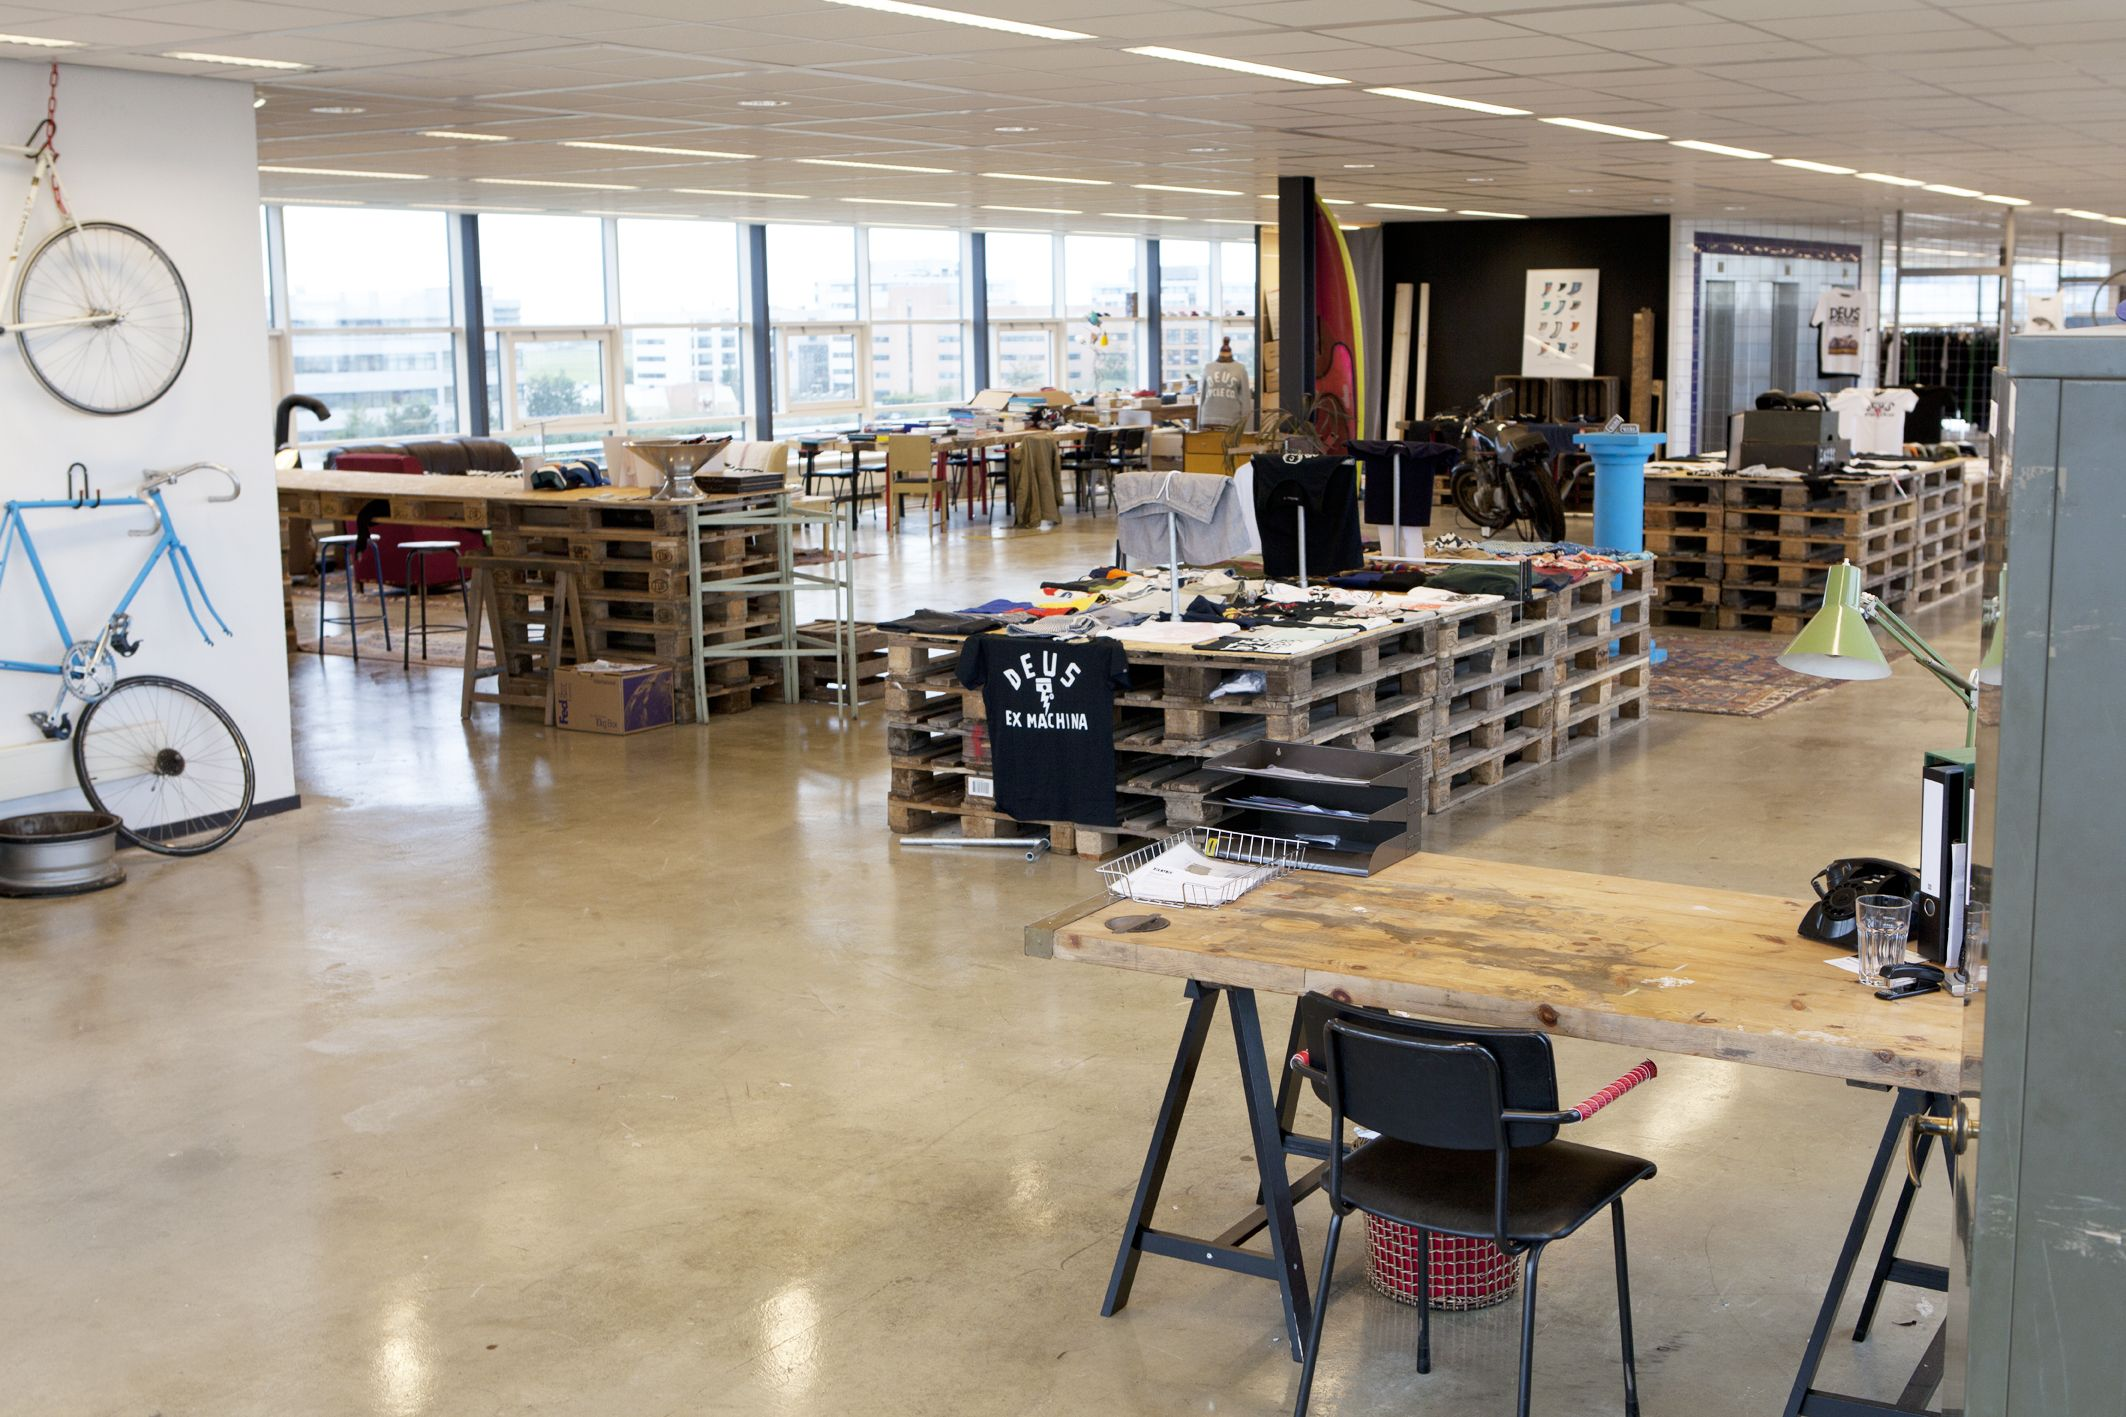 deus ex machina showroom designed by bricks showrooms. Black Bedroom Furniture Sets. Home Design Ideas